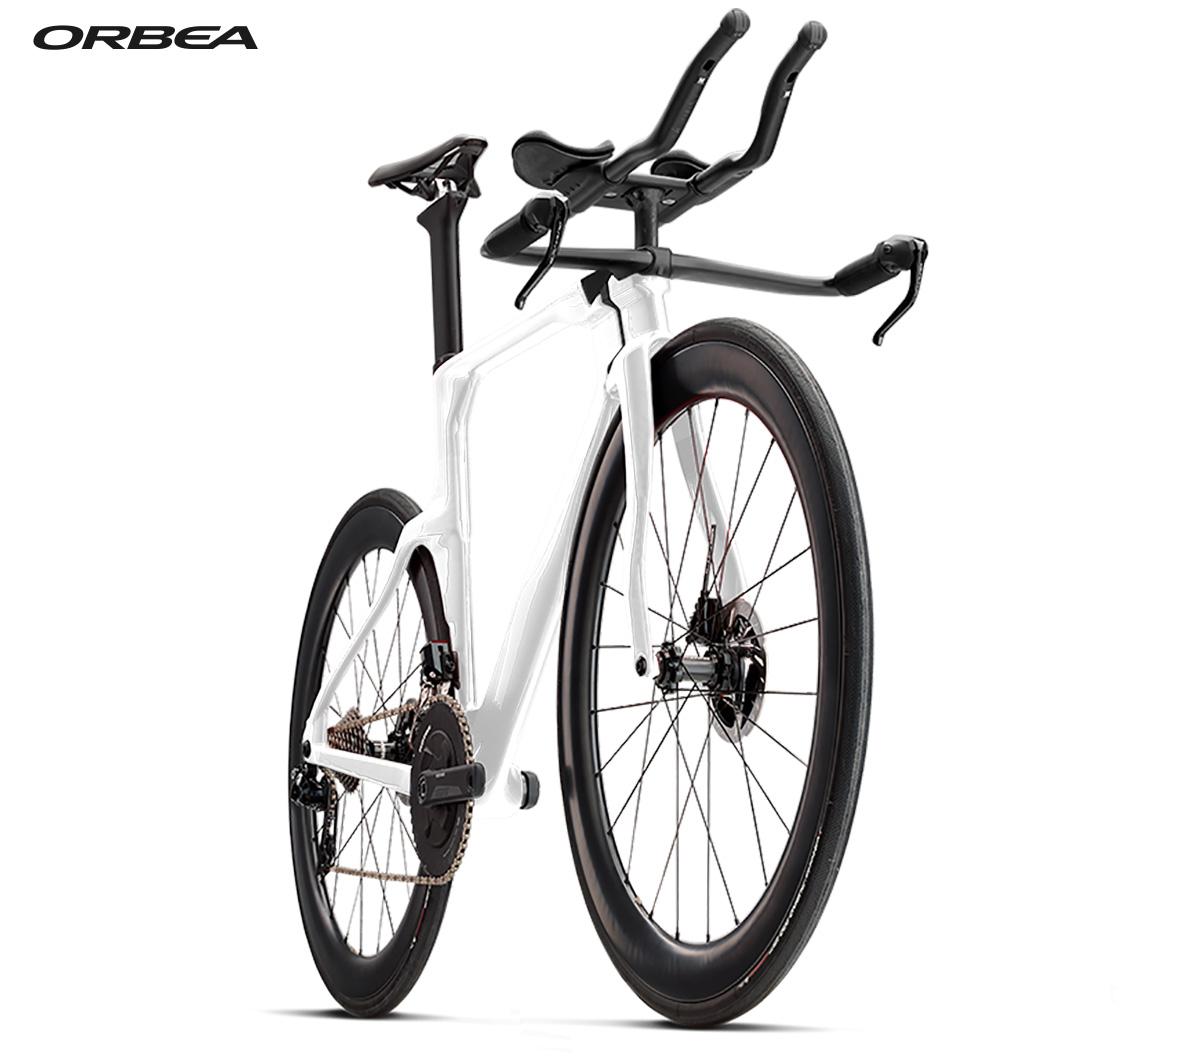 La nuova bici da triathlon Orbea Ordu M20LTD 2021 vista di trequarti